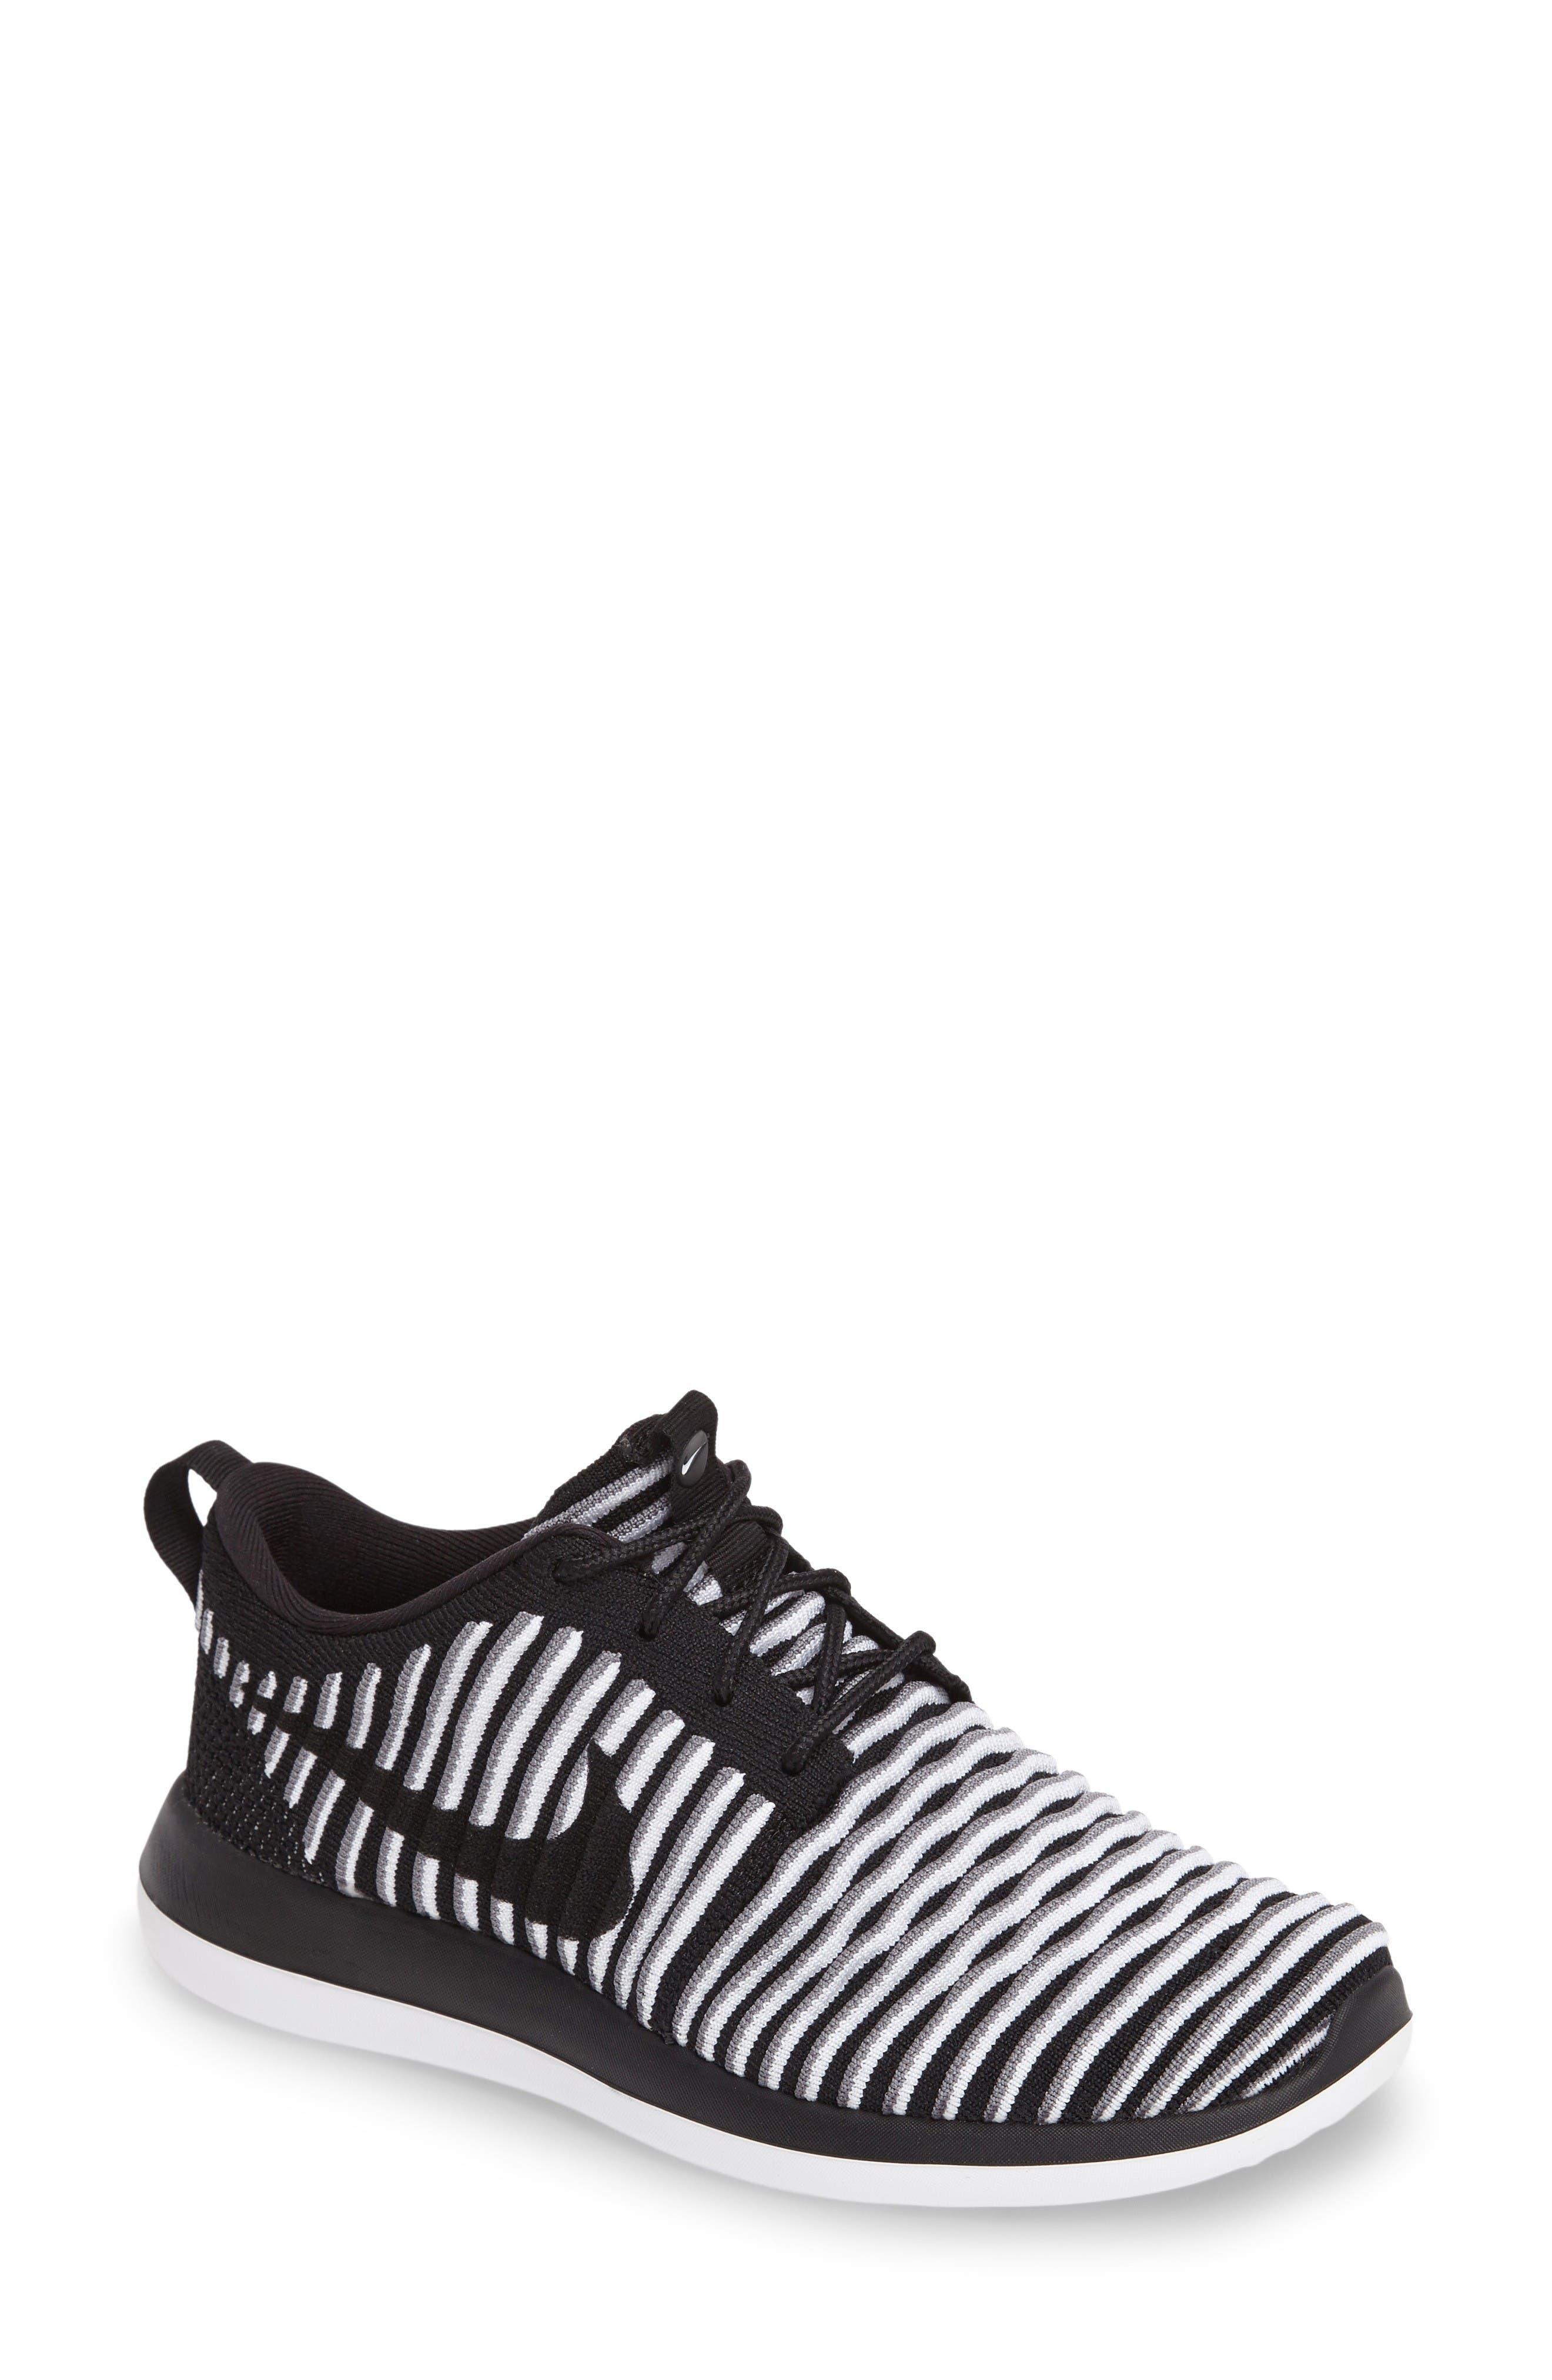 Main Image - Nike Roshe Two FlyKnit Sneaker (Women)